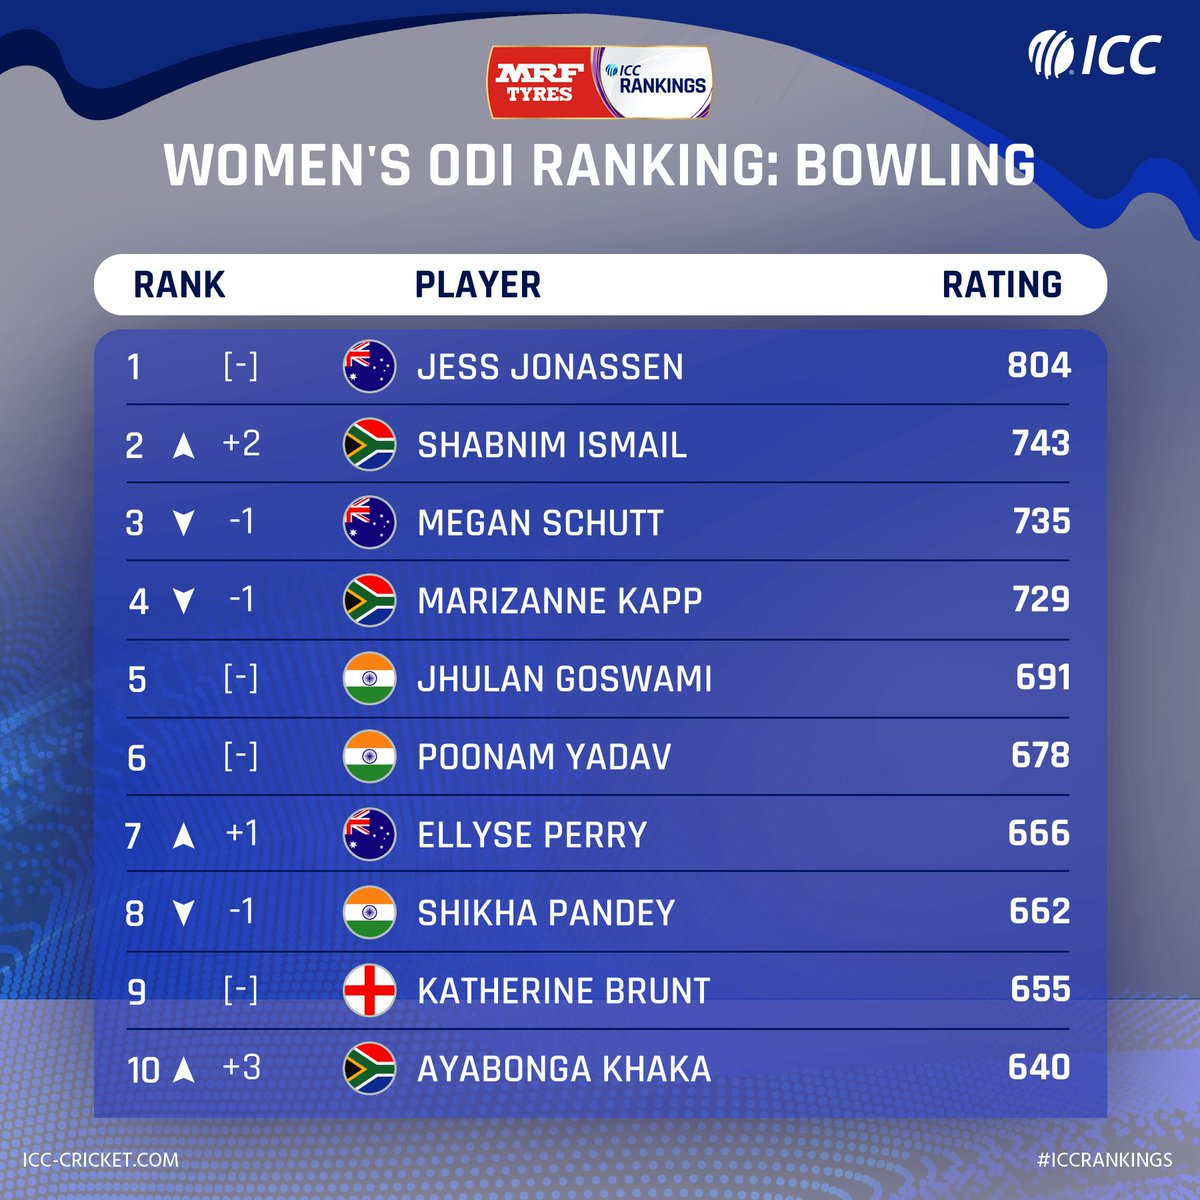 💥 Shabnim Ismail is the new No.2 ODI bowler 🙌 Ayabonga Khaka enters top 10  South Africa pacers shine in the weekly @MRFWorldwide ICC Women's ODI Rankings update!  Full list: